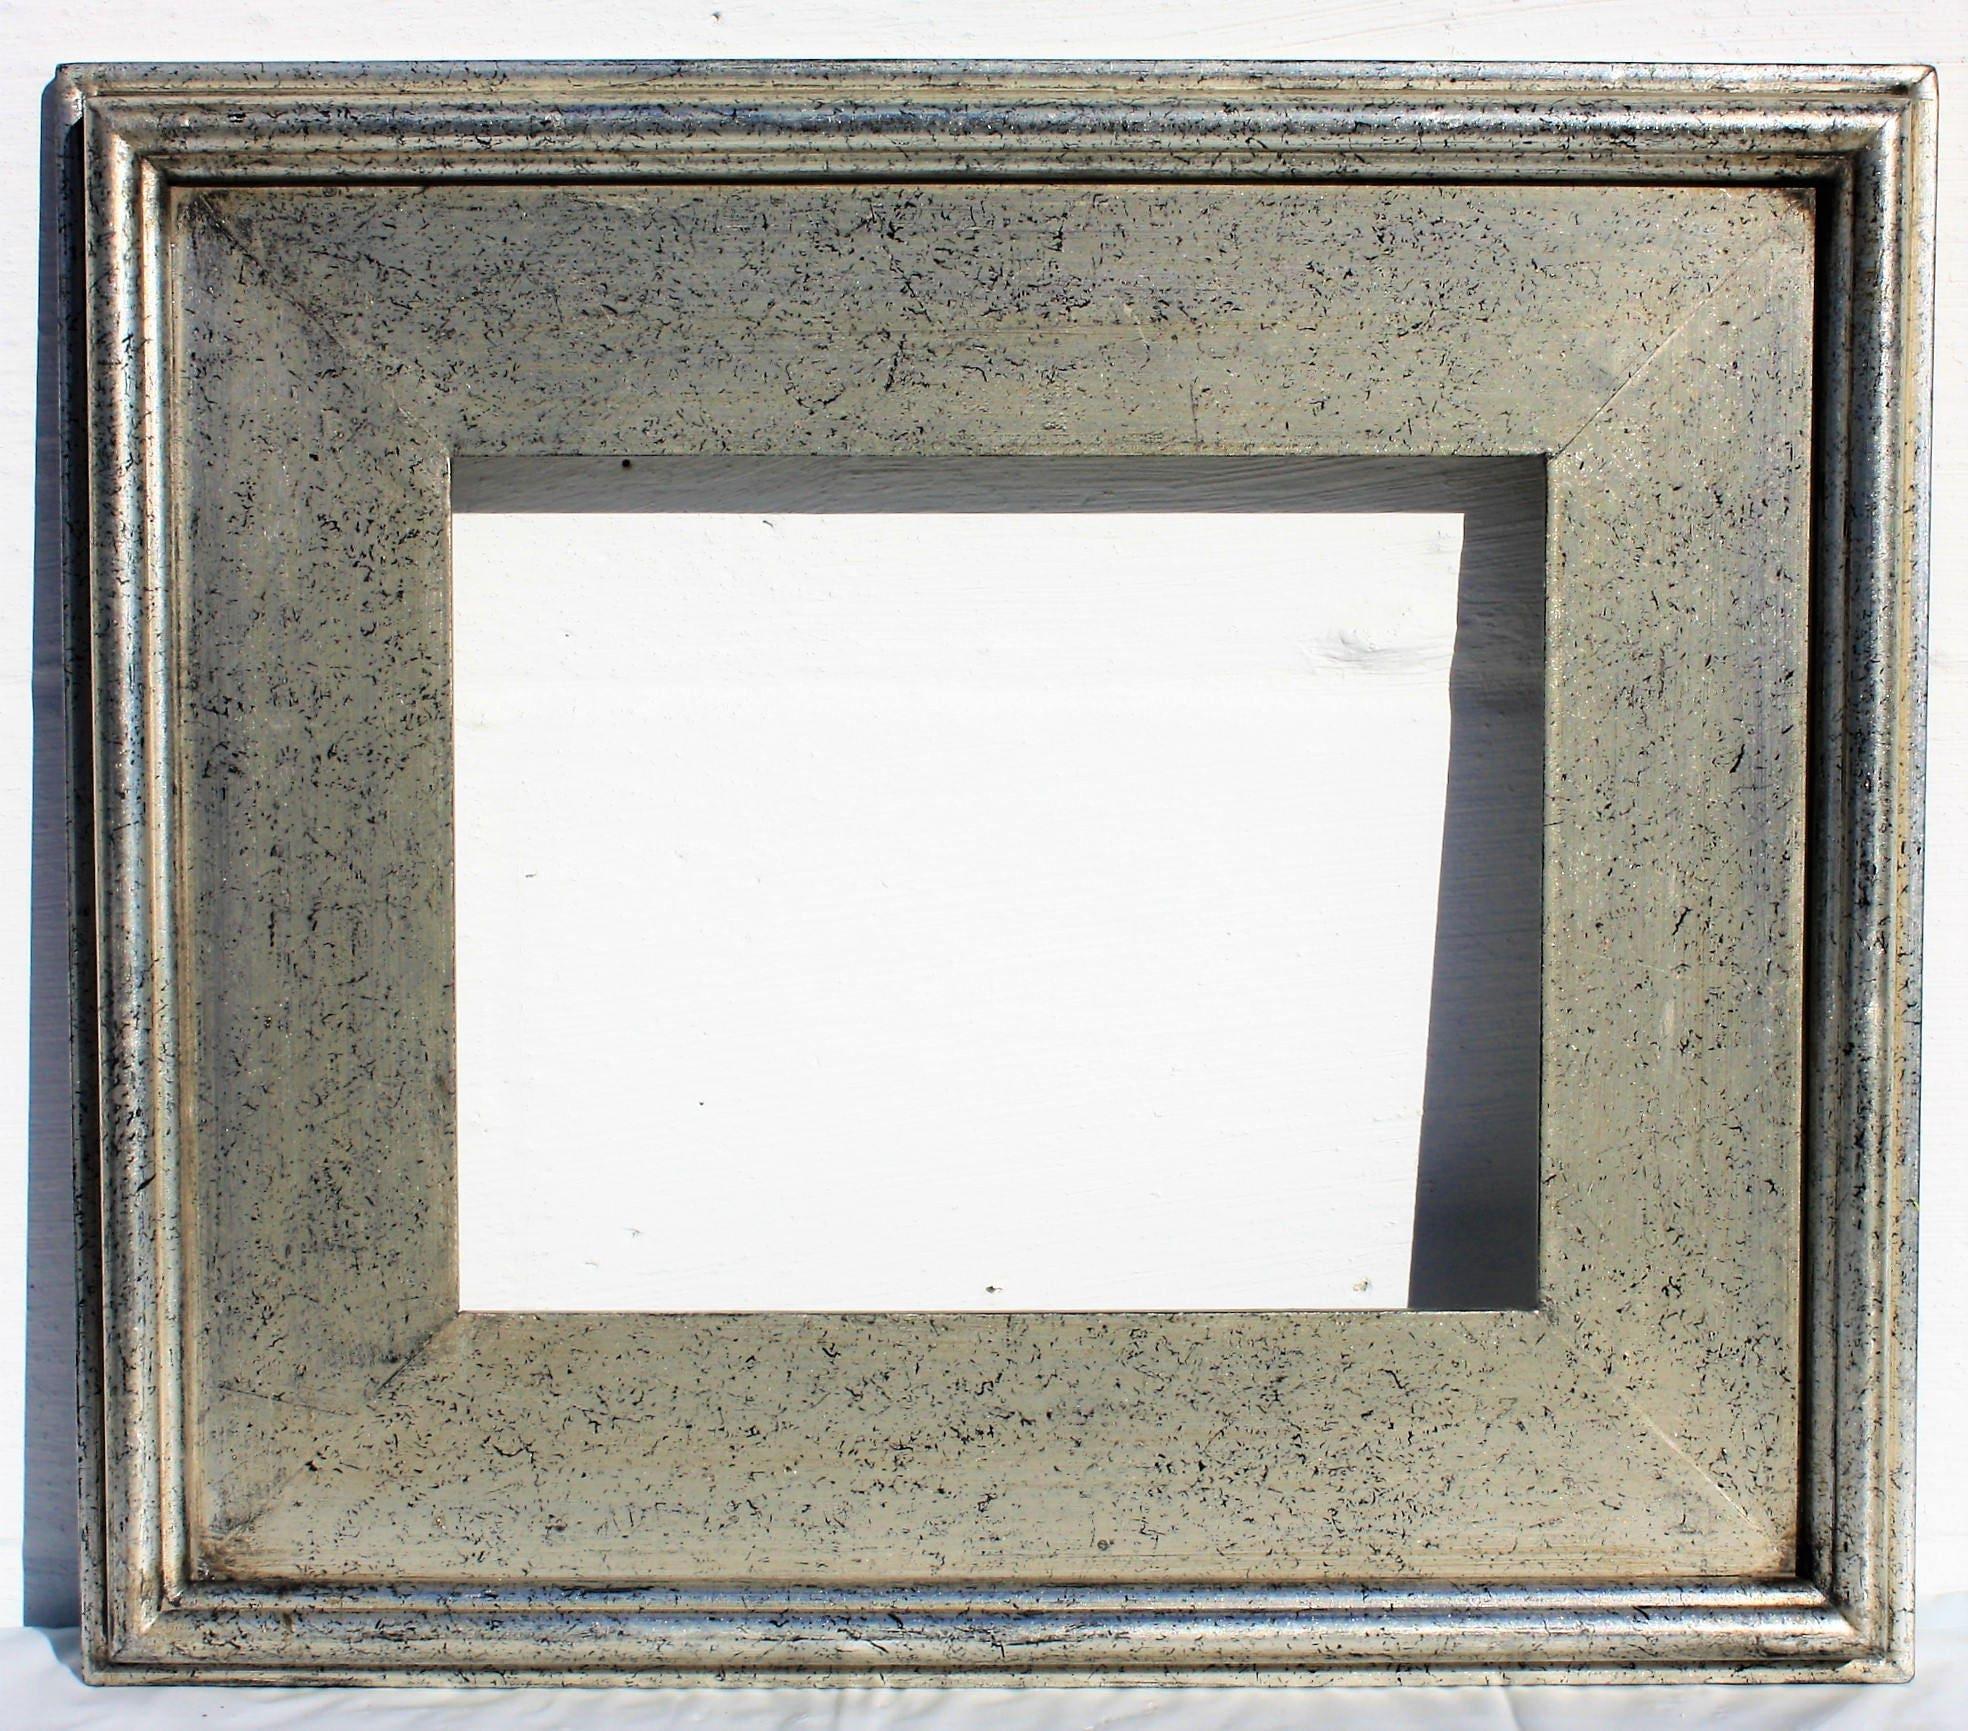 Silver Plein Air Picture Frames Modern 12x16 Black Speckled